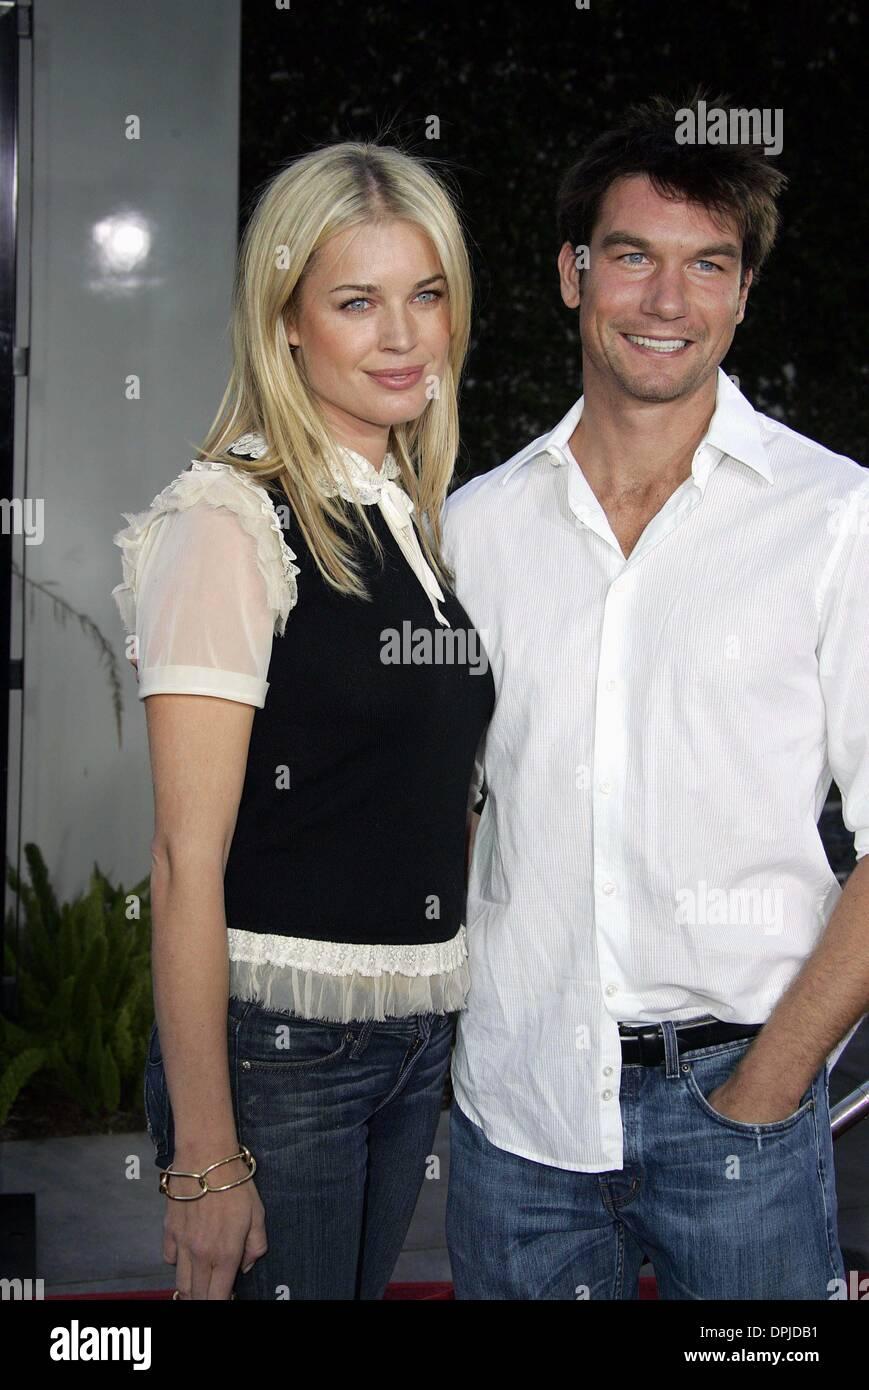 Dec 27 2005 Hollywood Los Angeles Usa Rebecca Romijn Jerry Stock Photo Alamy